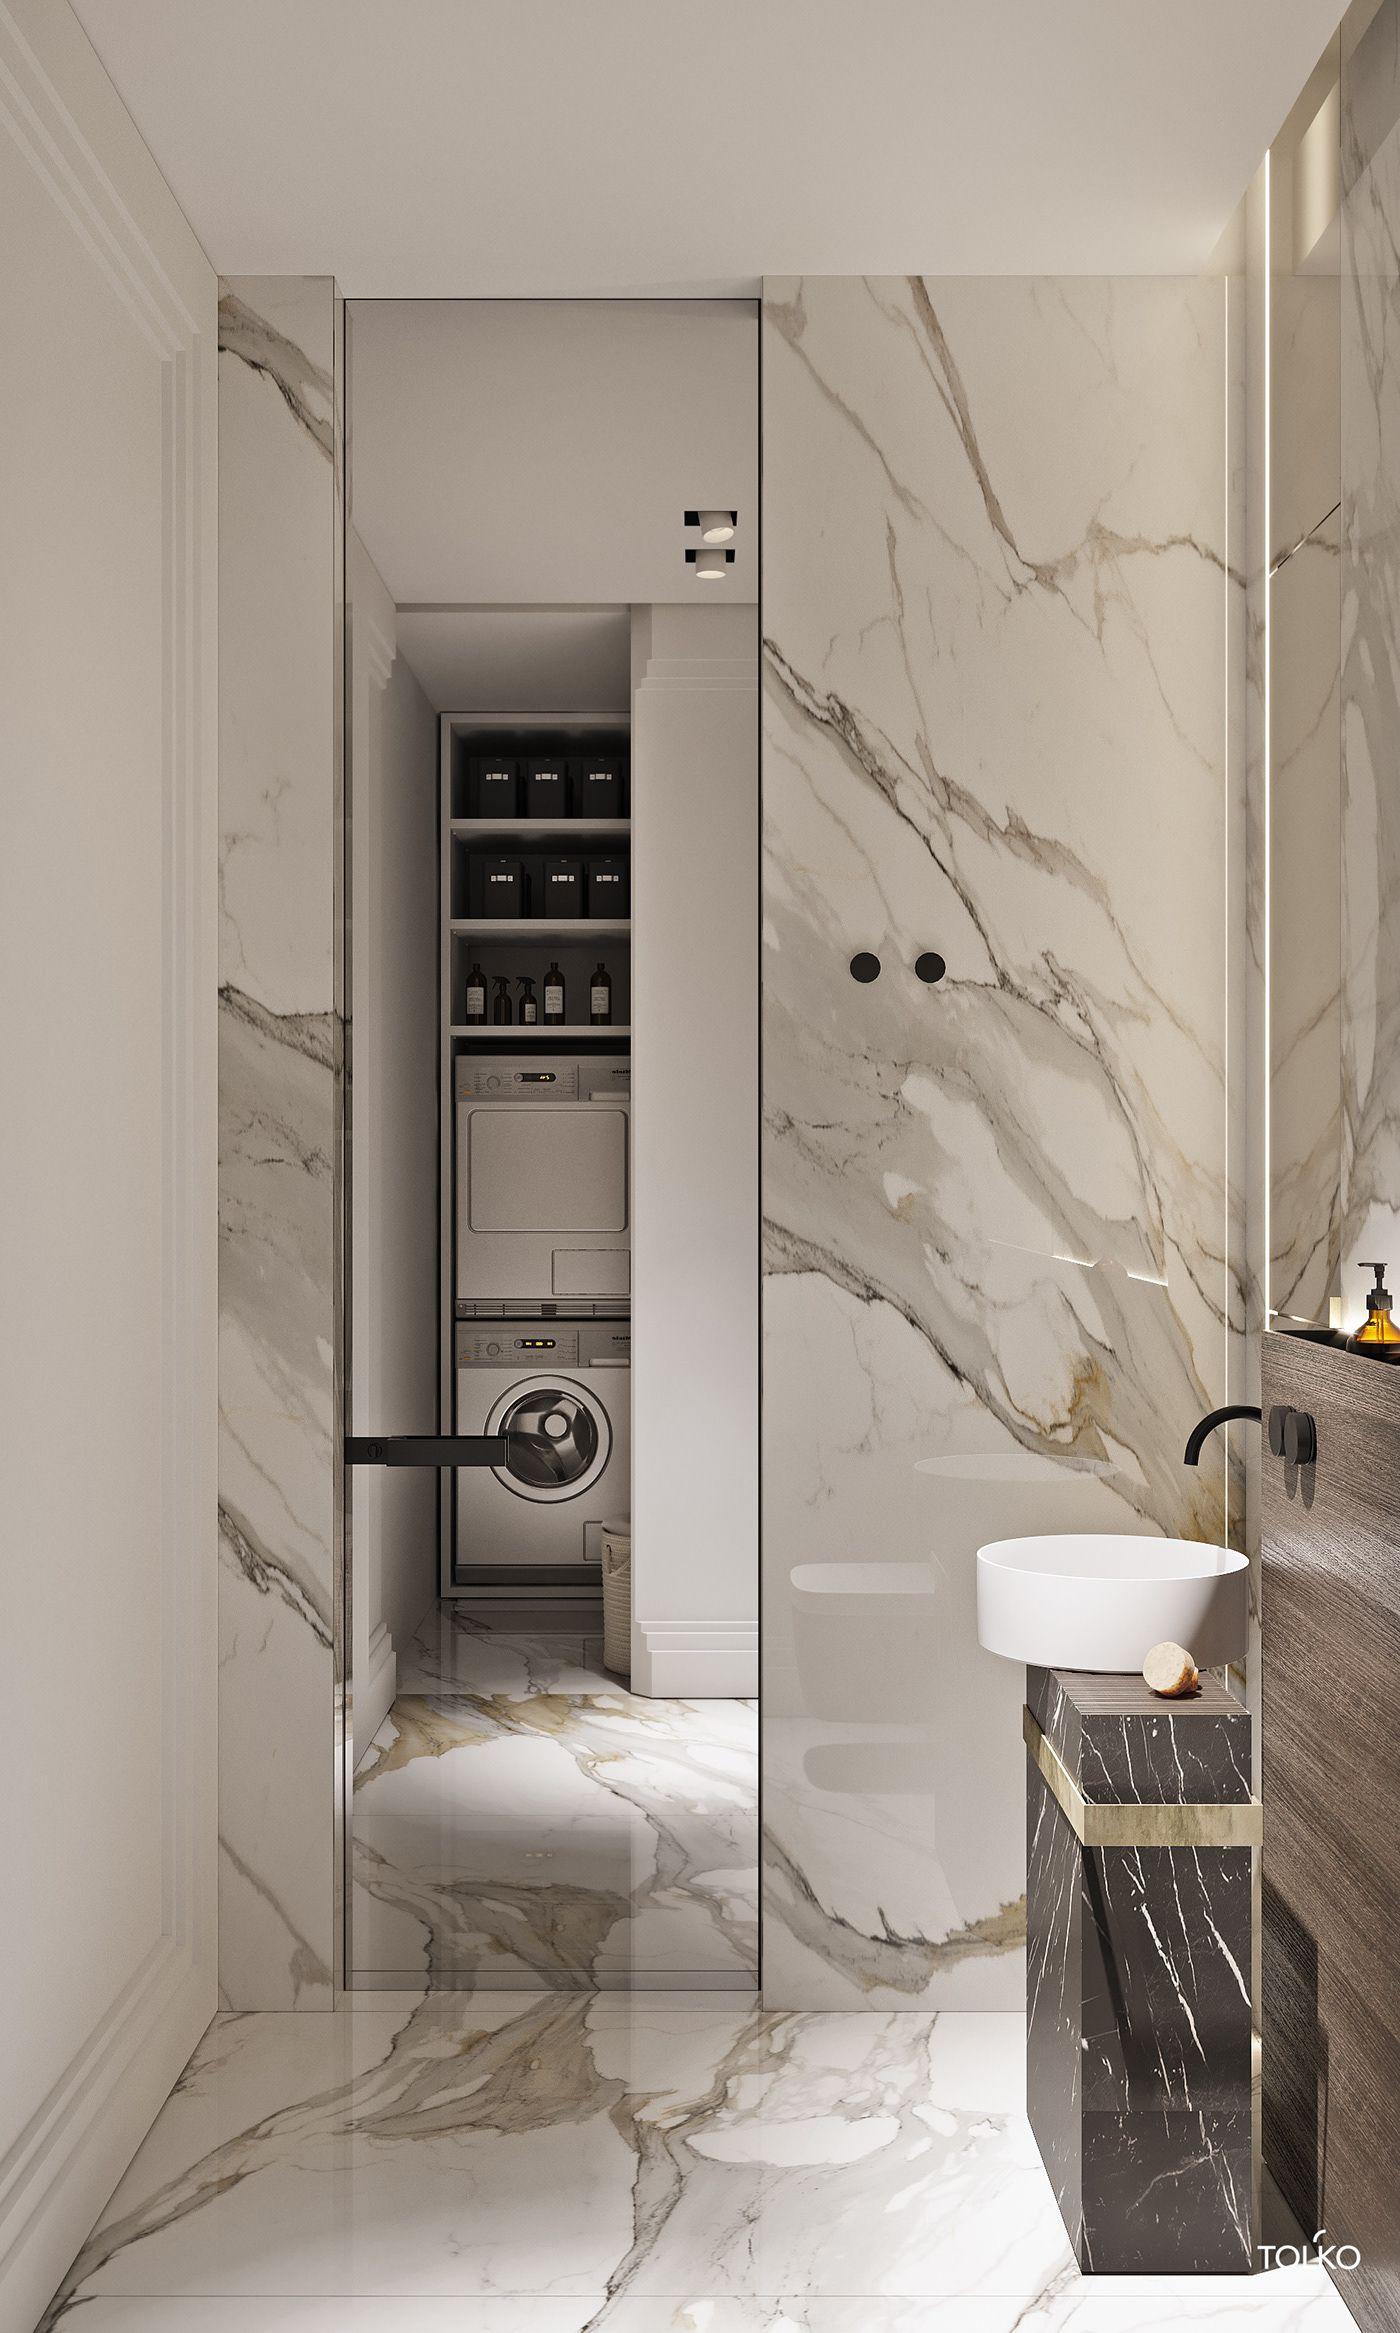 Tol Ko Latte Flat In Smolensky Deluxe On Behance Bathroom Interior Design Luxury Bathroom Bathroom Design Luxury Bathroom apartment ideas gif